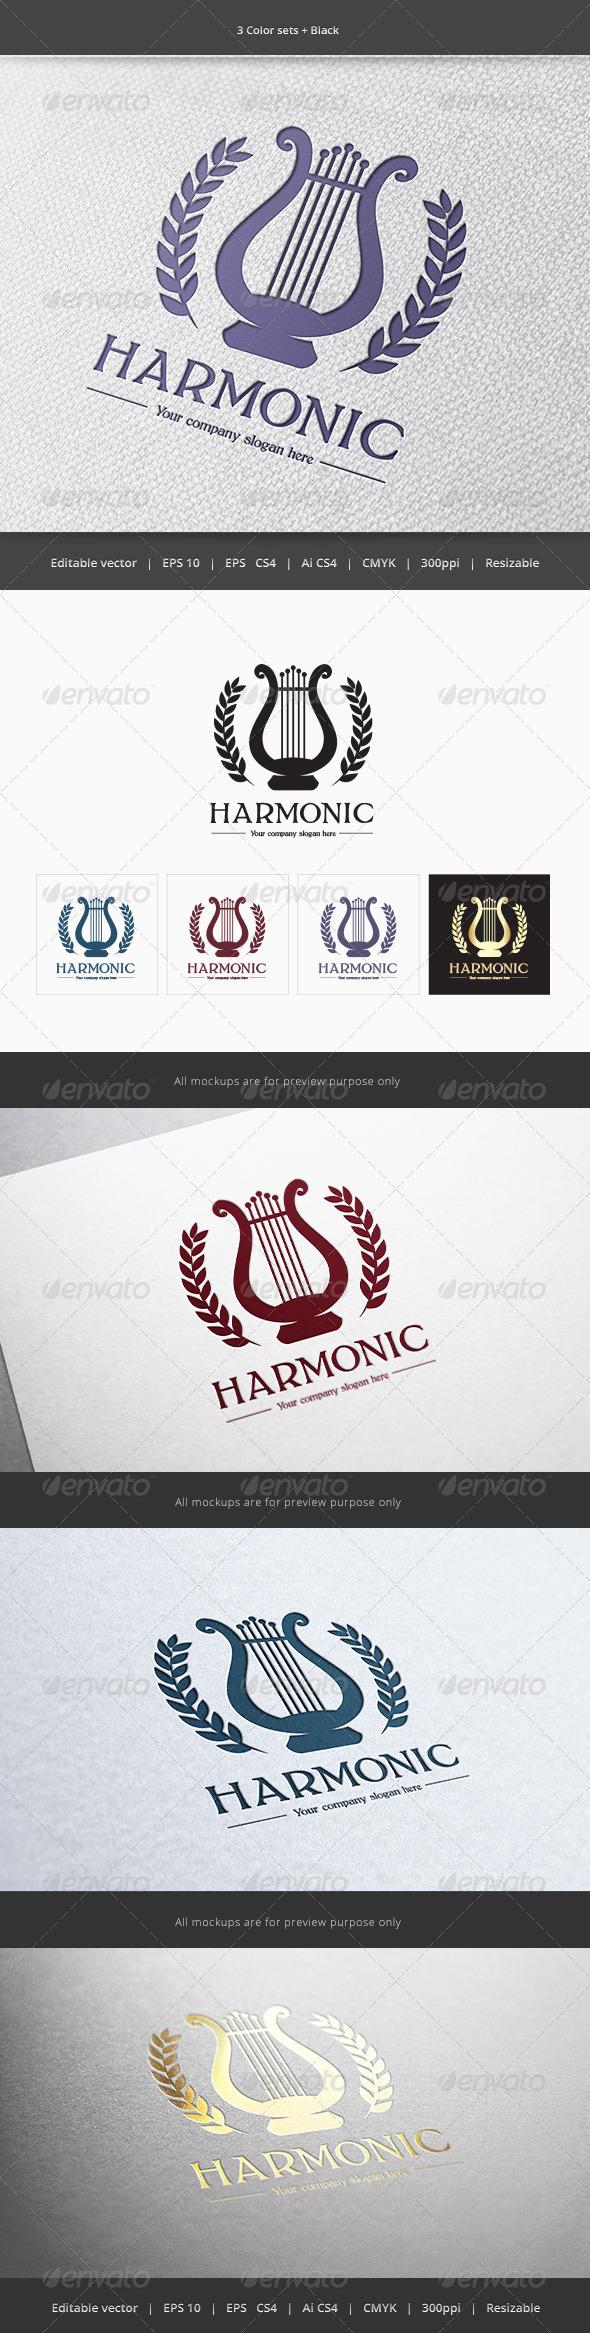 GraphicRiver Harmonic Music Logo 5889065